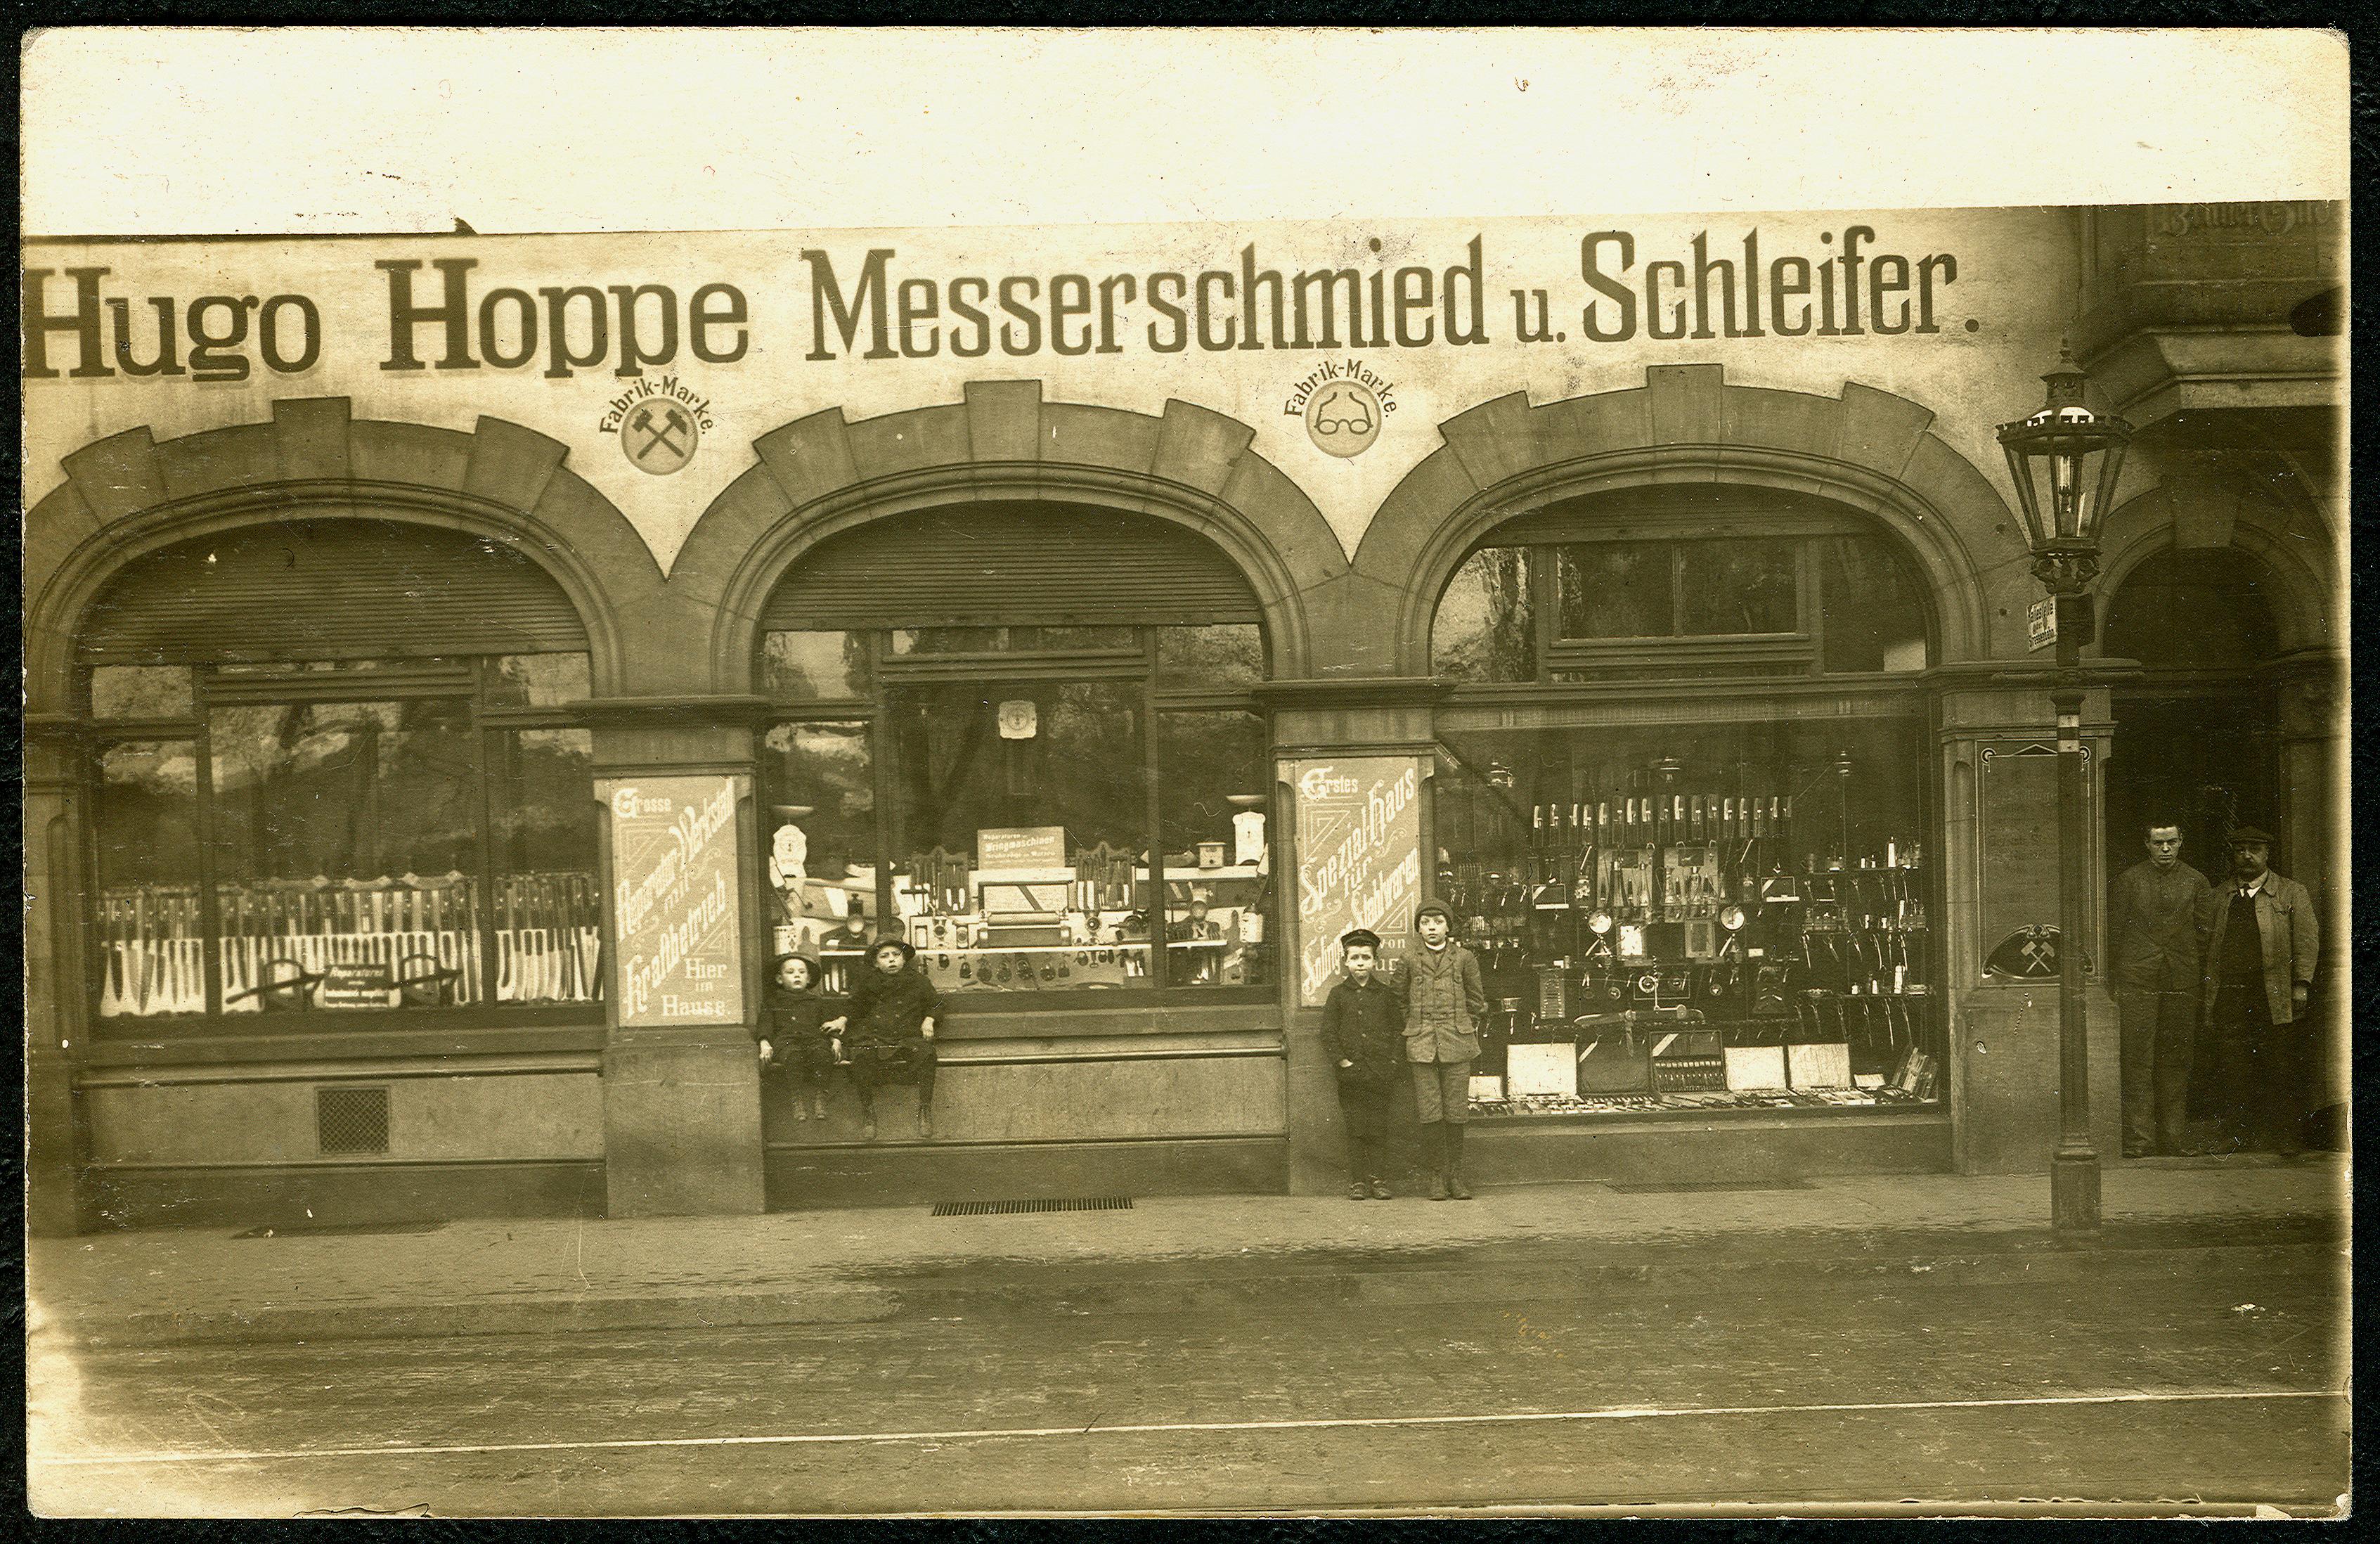 FileAK Hugo Hoppe Hannover Messerschmied Schleifer